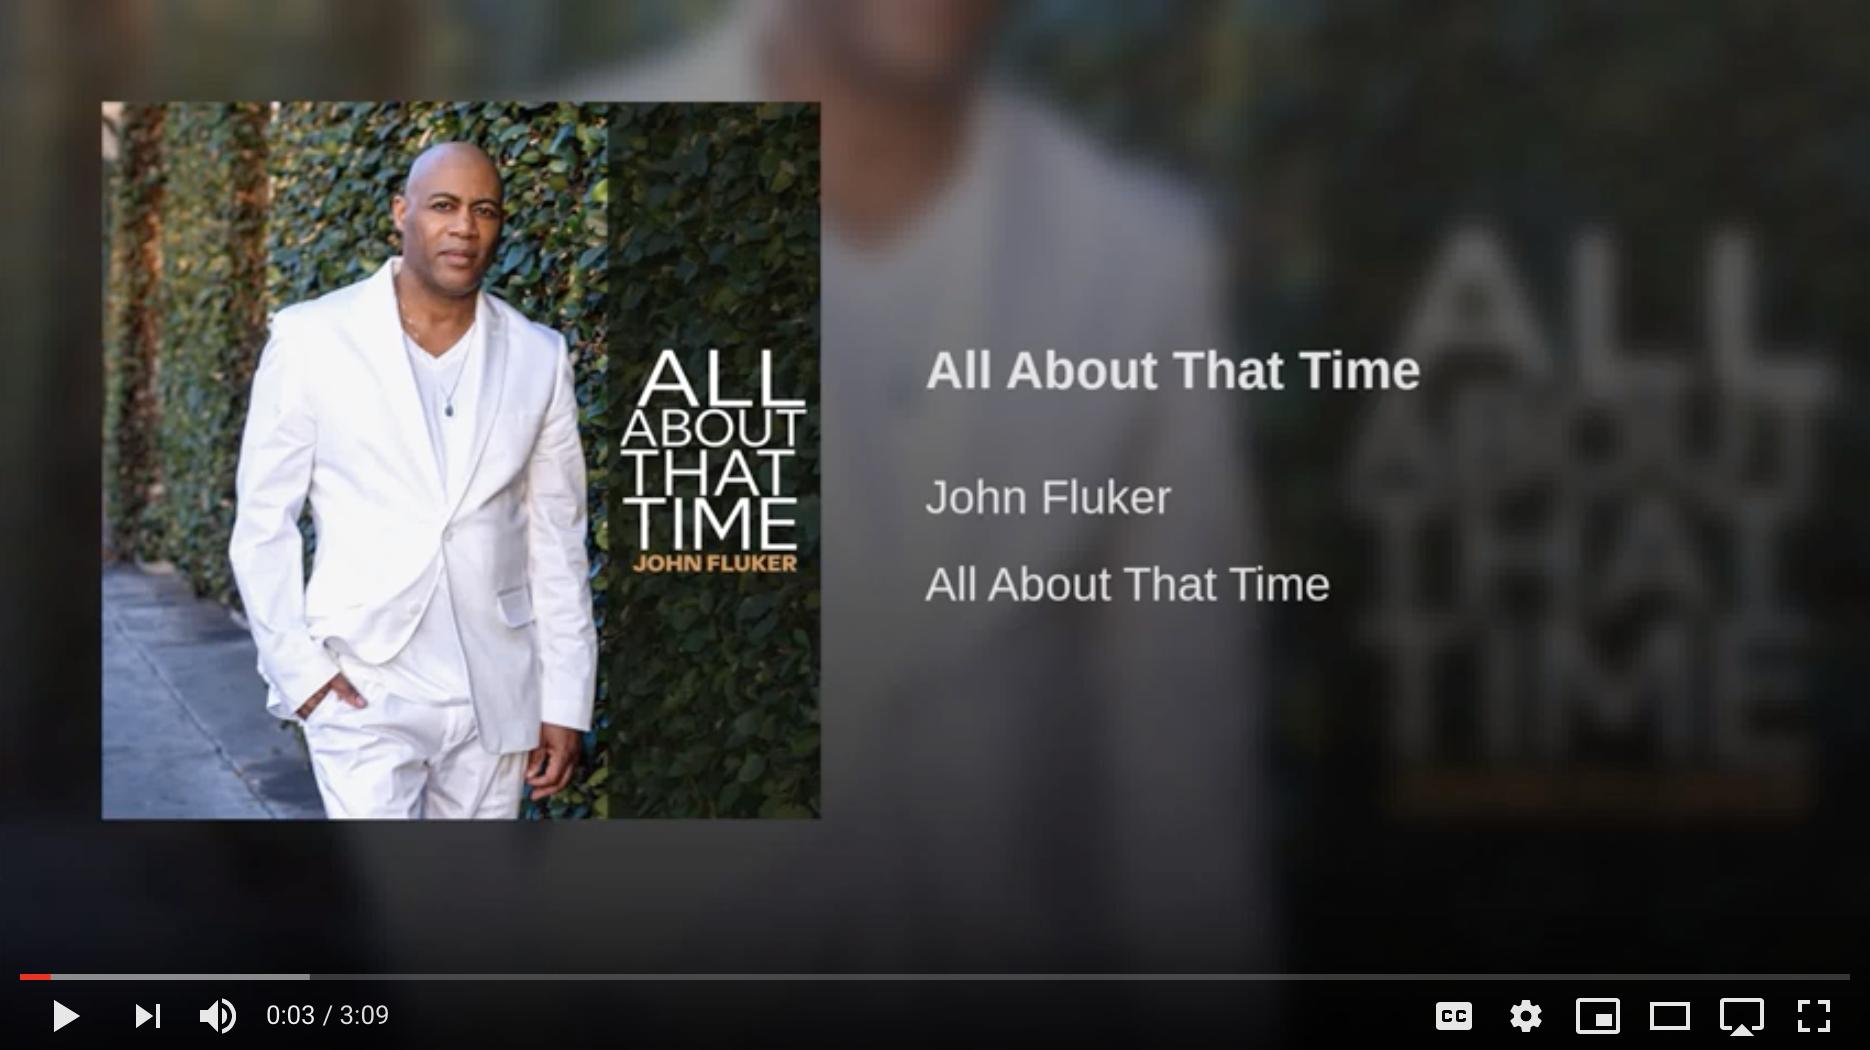 John Fluker - All About That Time